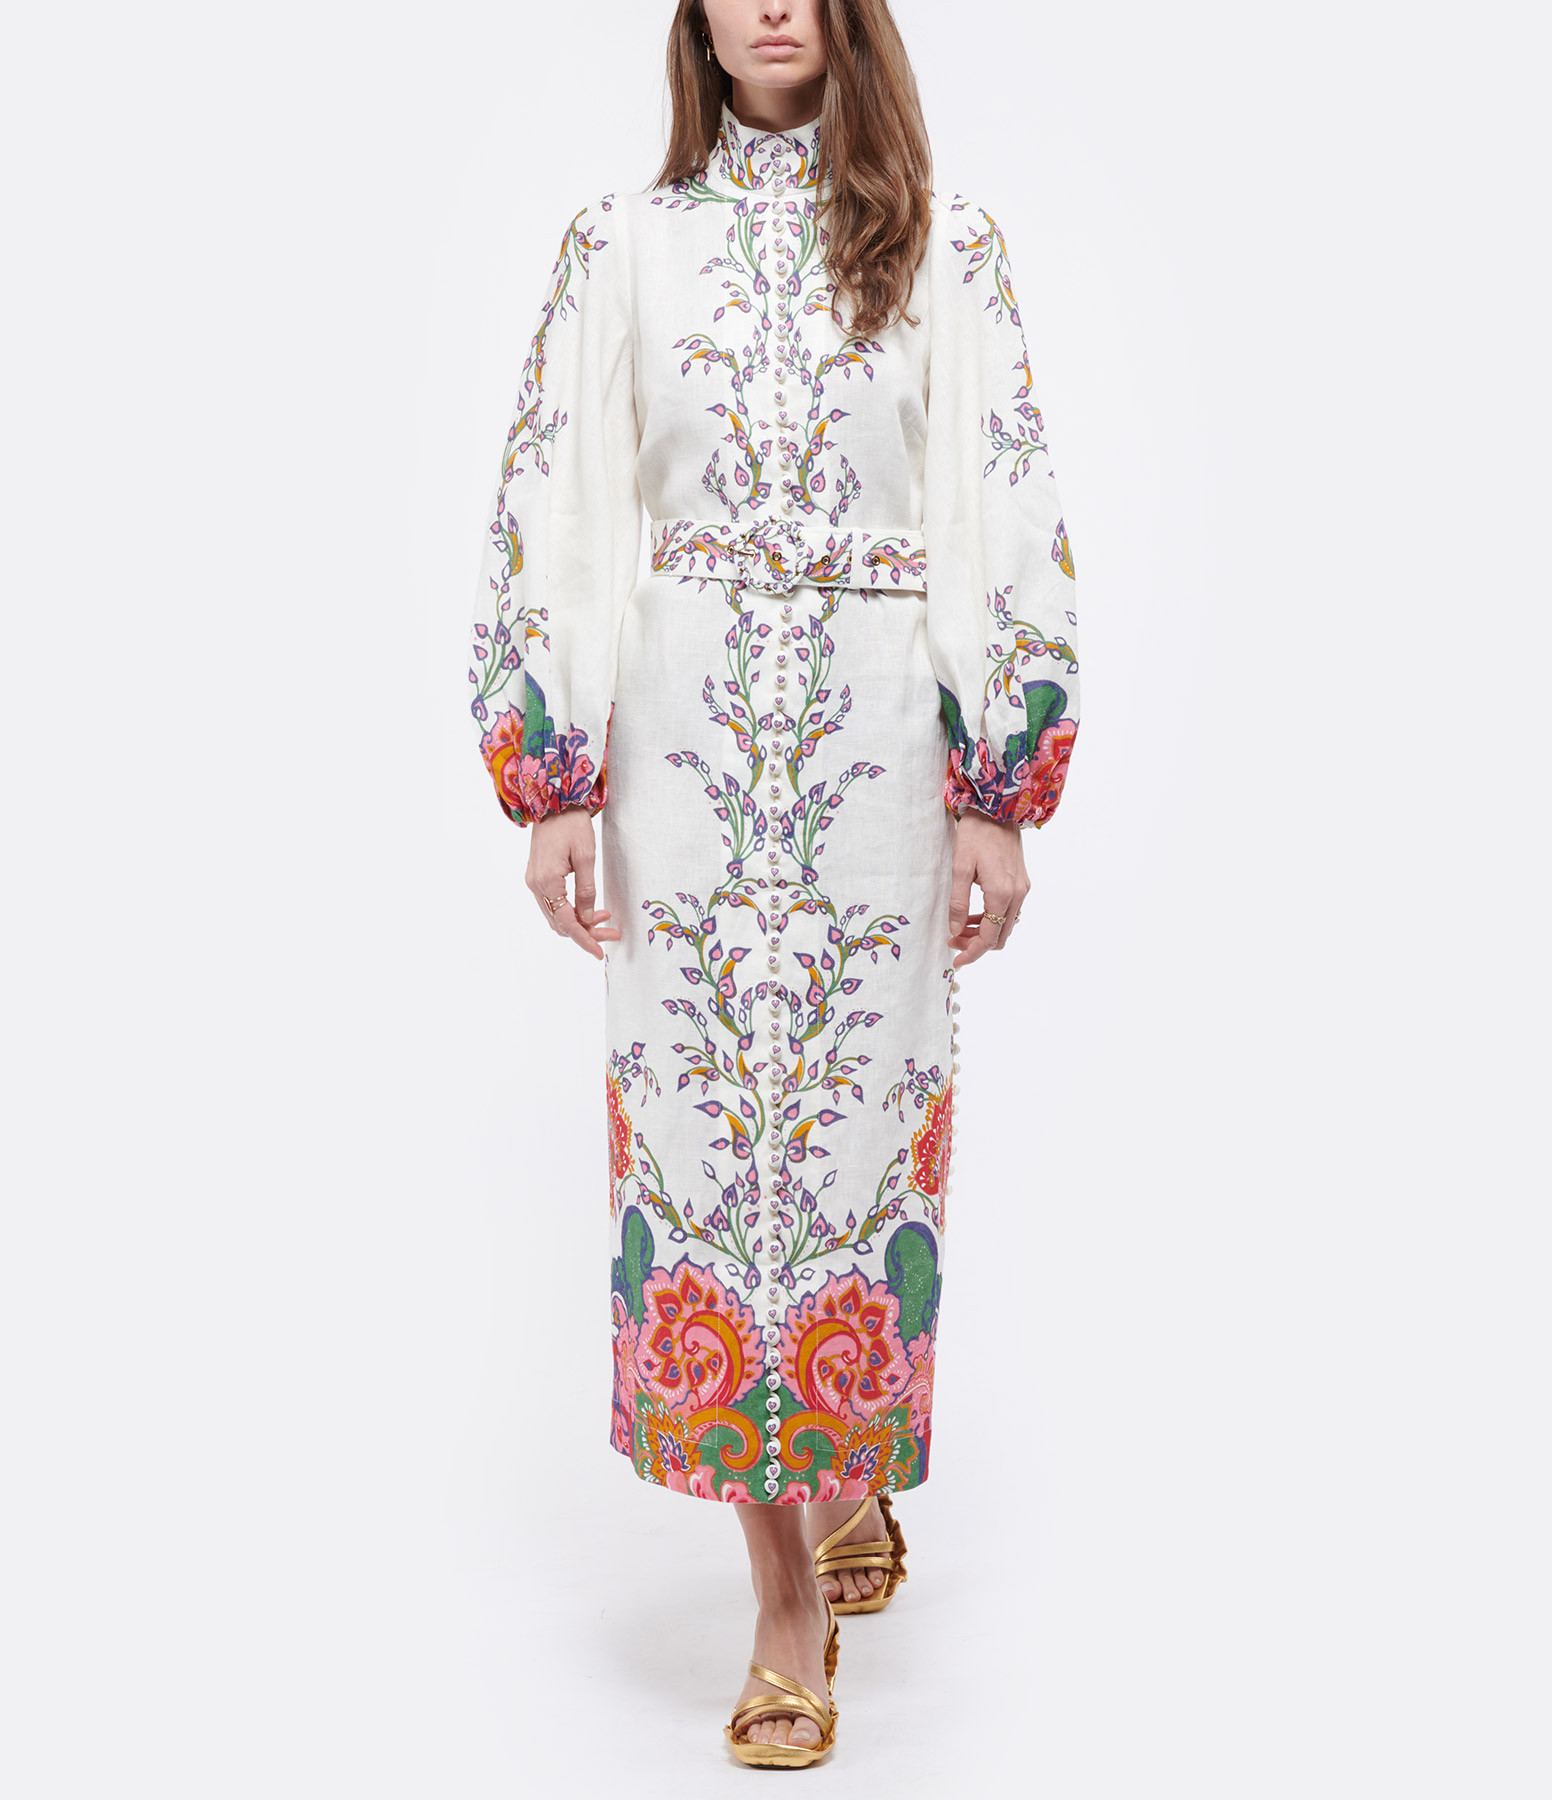 ZIMMERMANN - Robe The Lovestruck Lin Naturel Paisley Floral